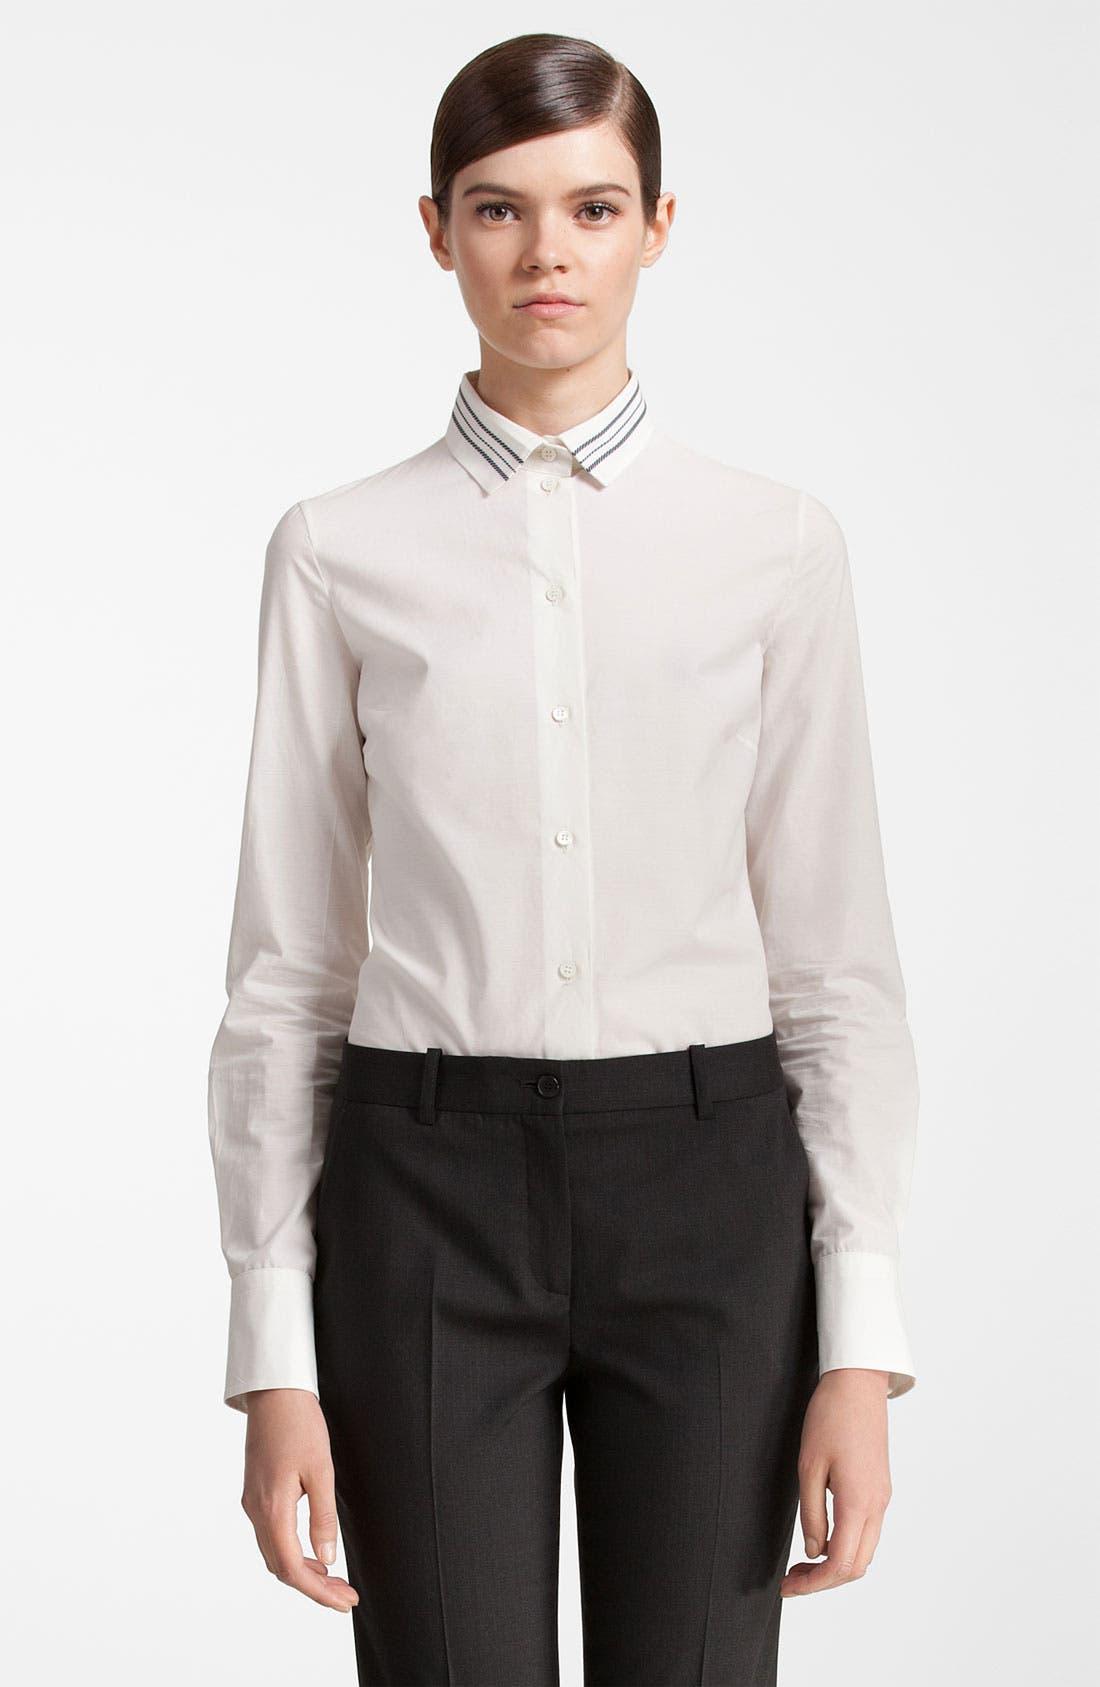 Alternate Image 1 Selected - Jil Sander Navy Stripe Collar Shirt